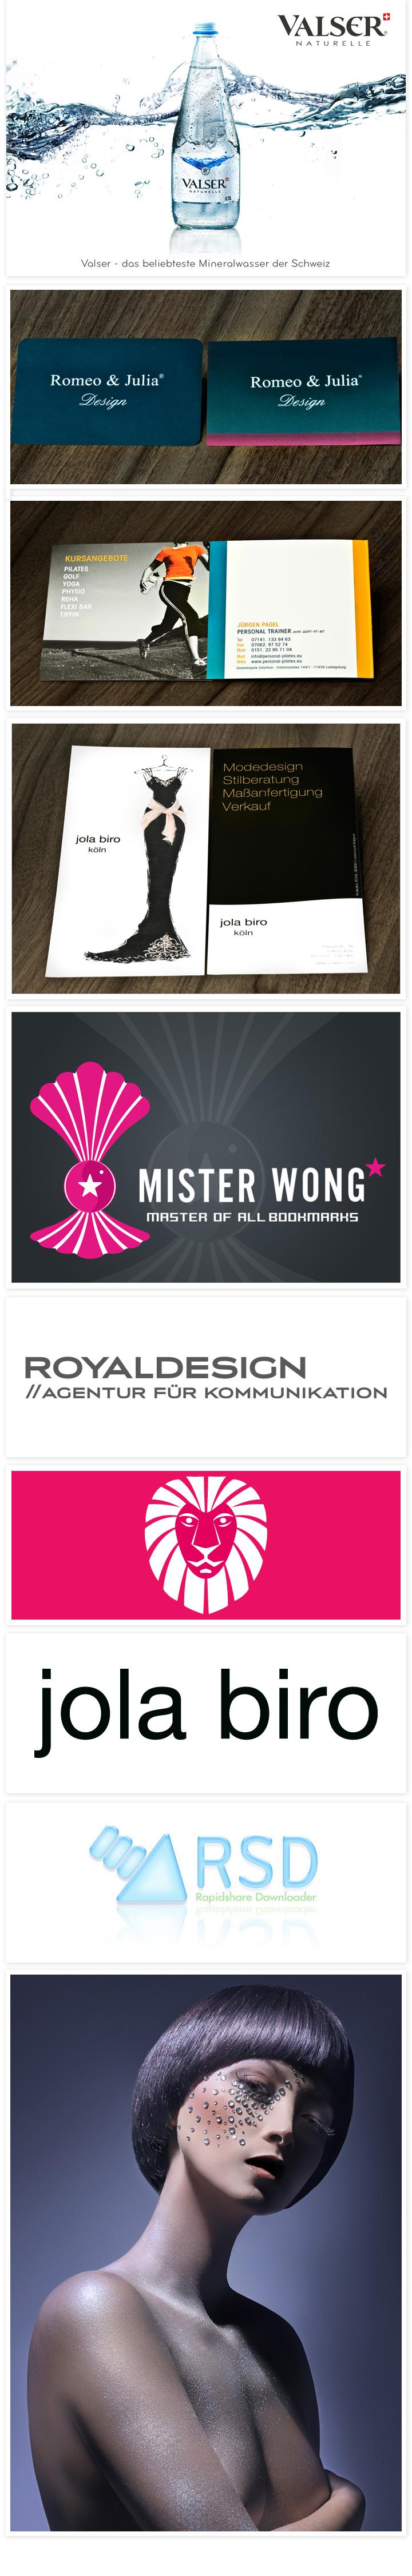 royal-design-various-06